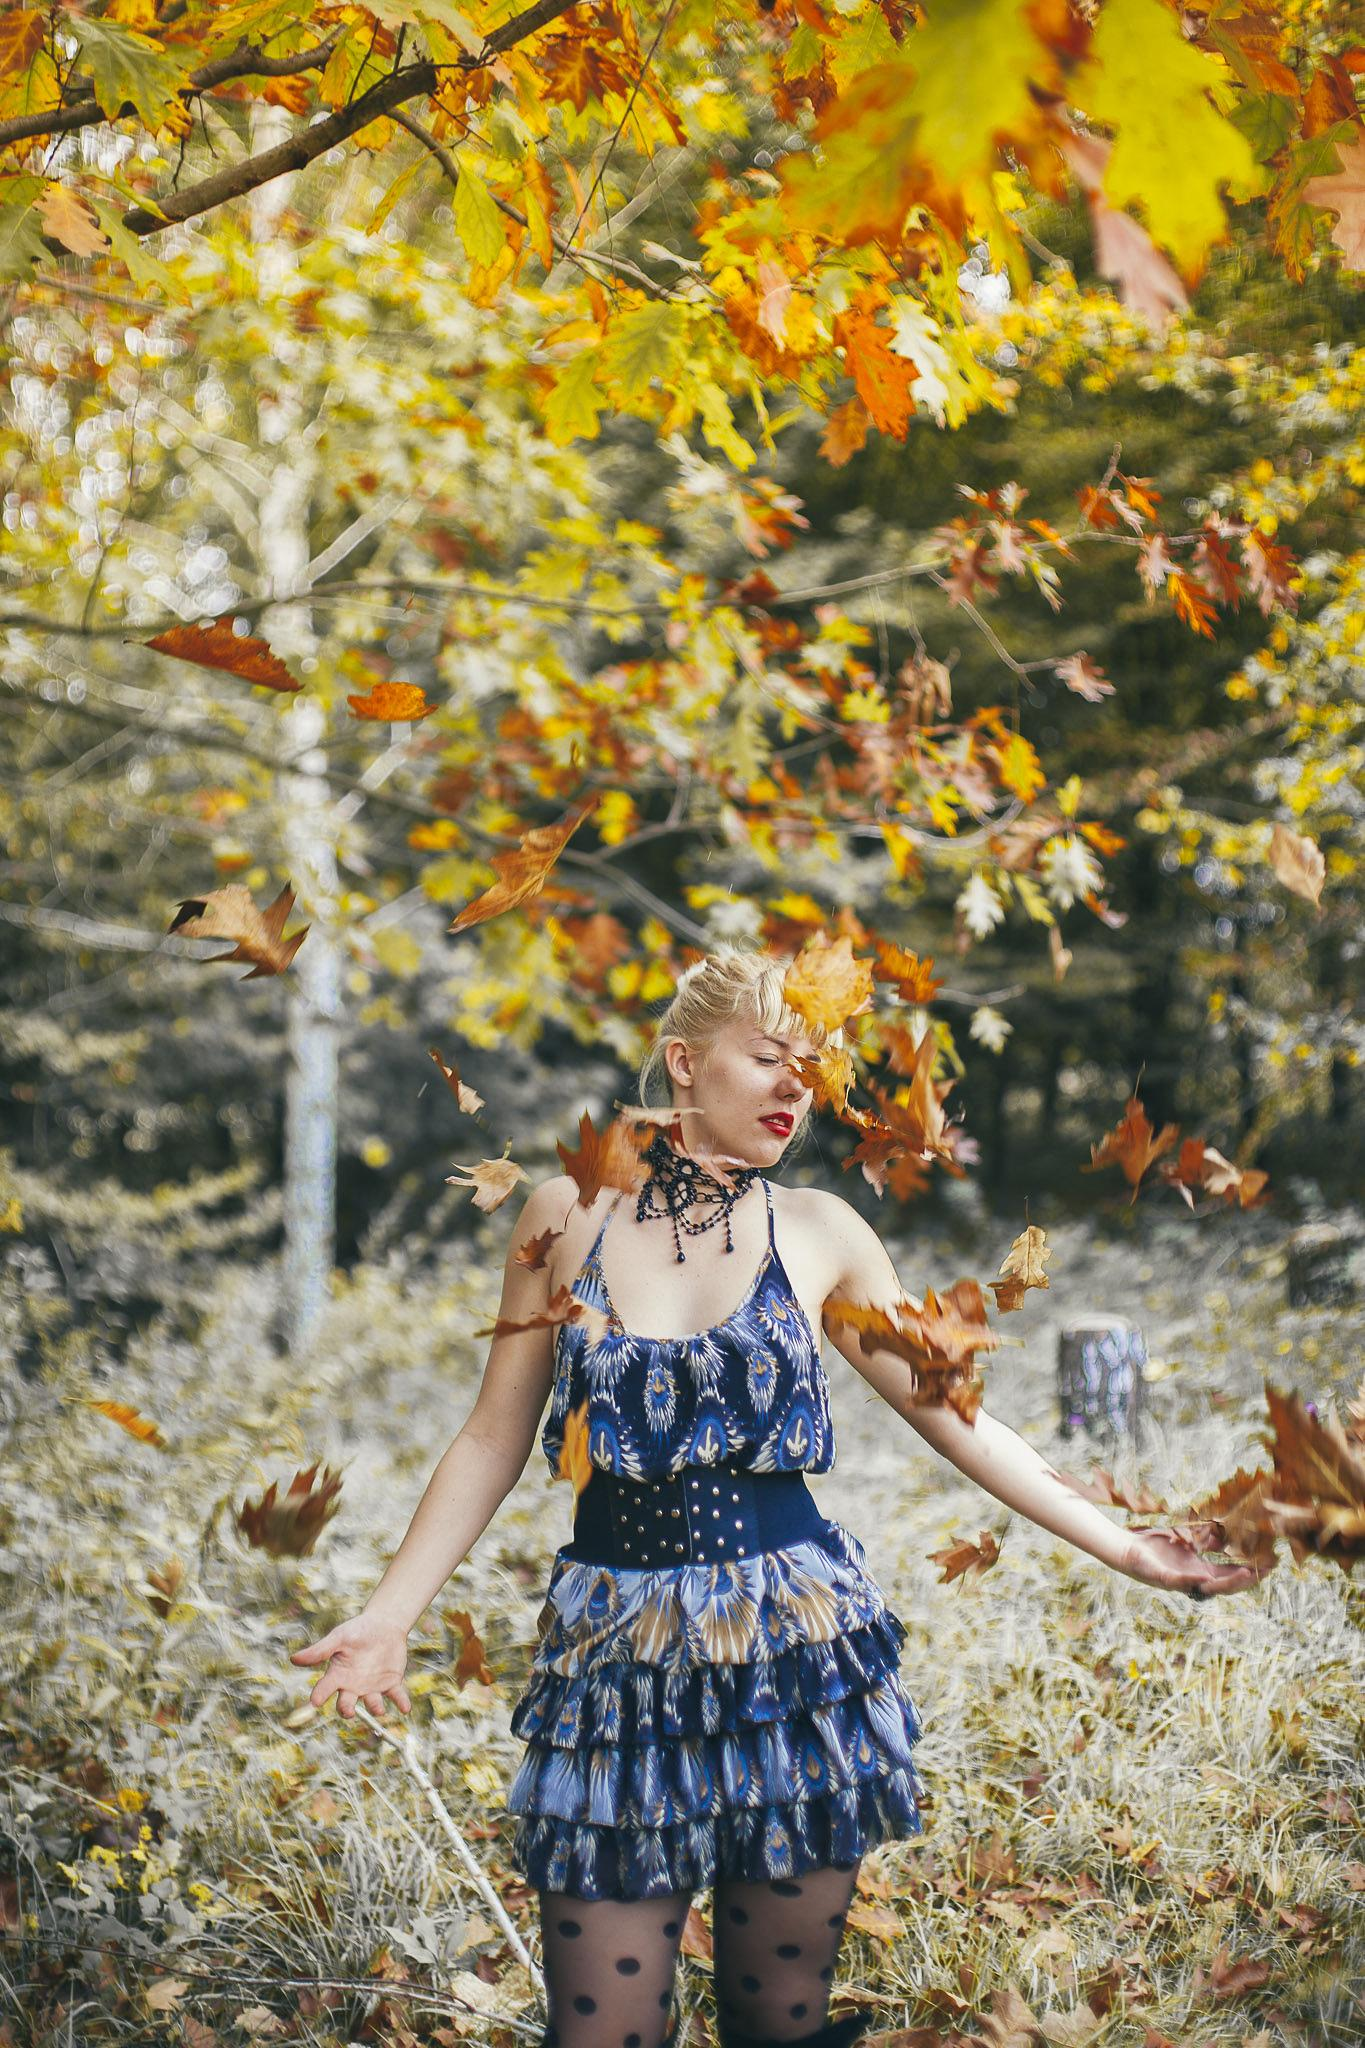 Autumn by Josipa Bjelobrk